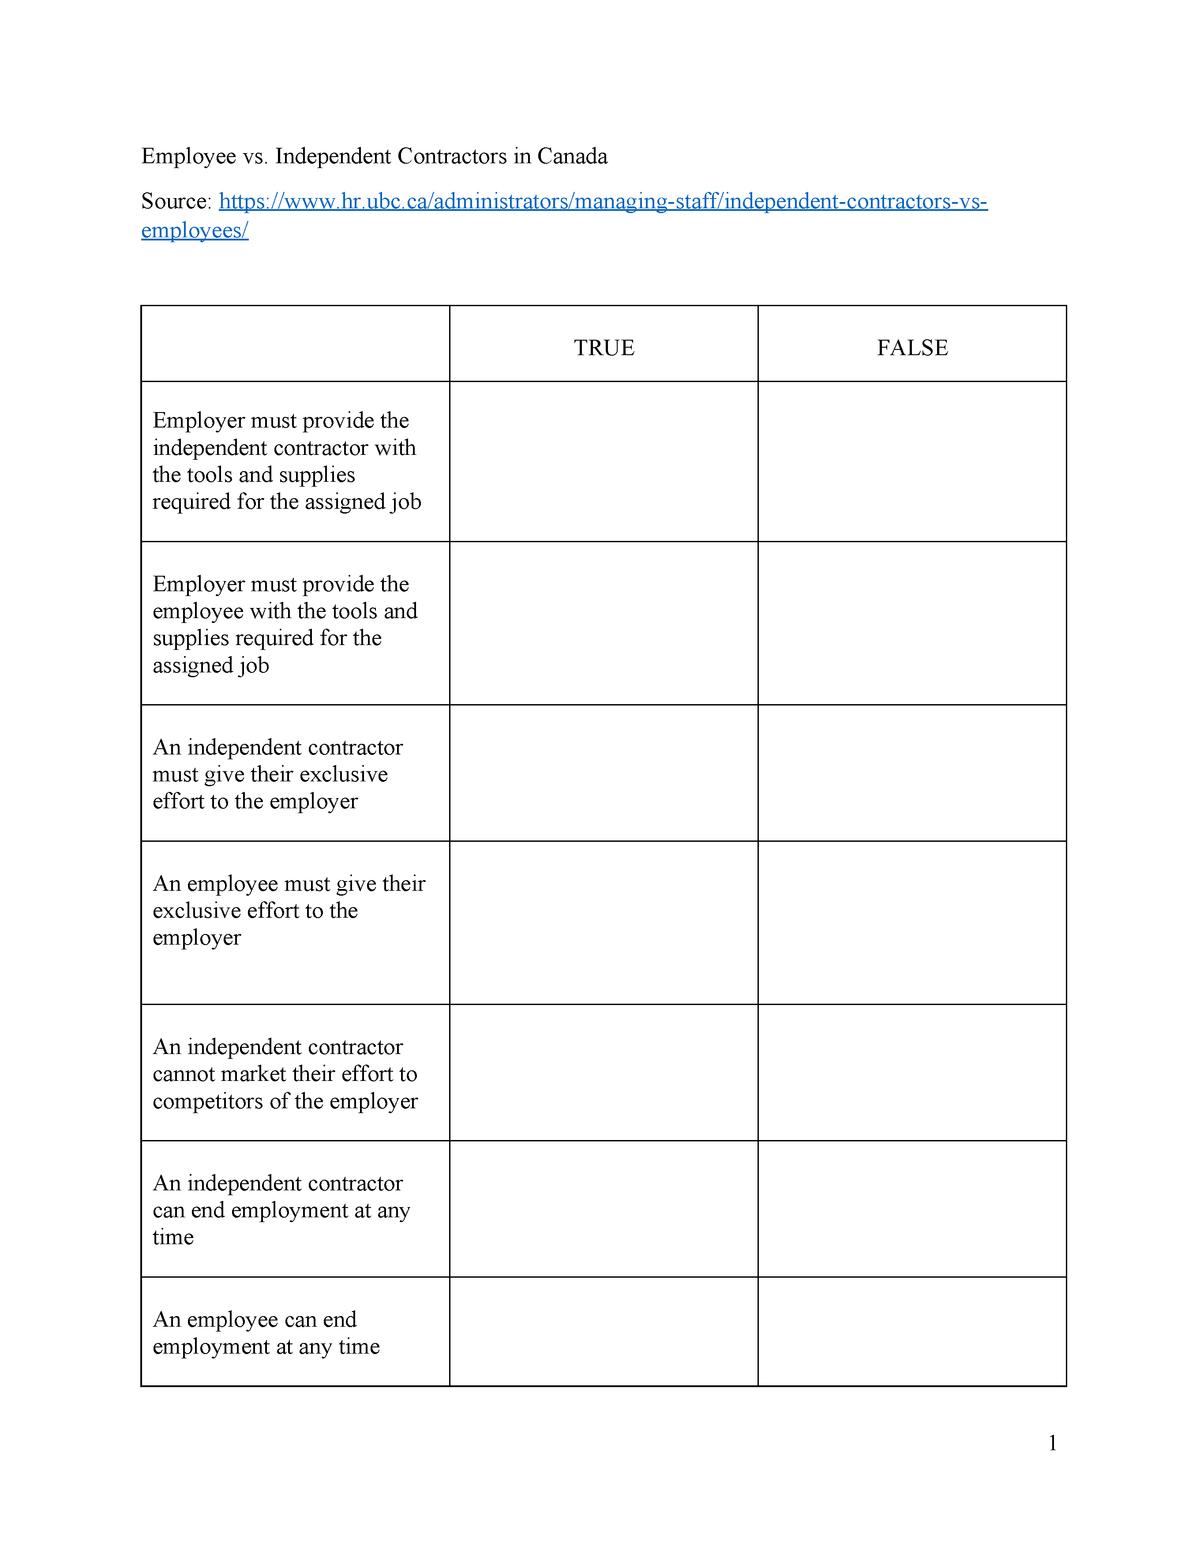 Employee-Contractor-Quiz - MAS: Personnel administration